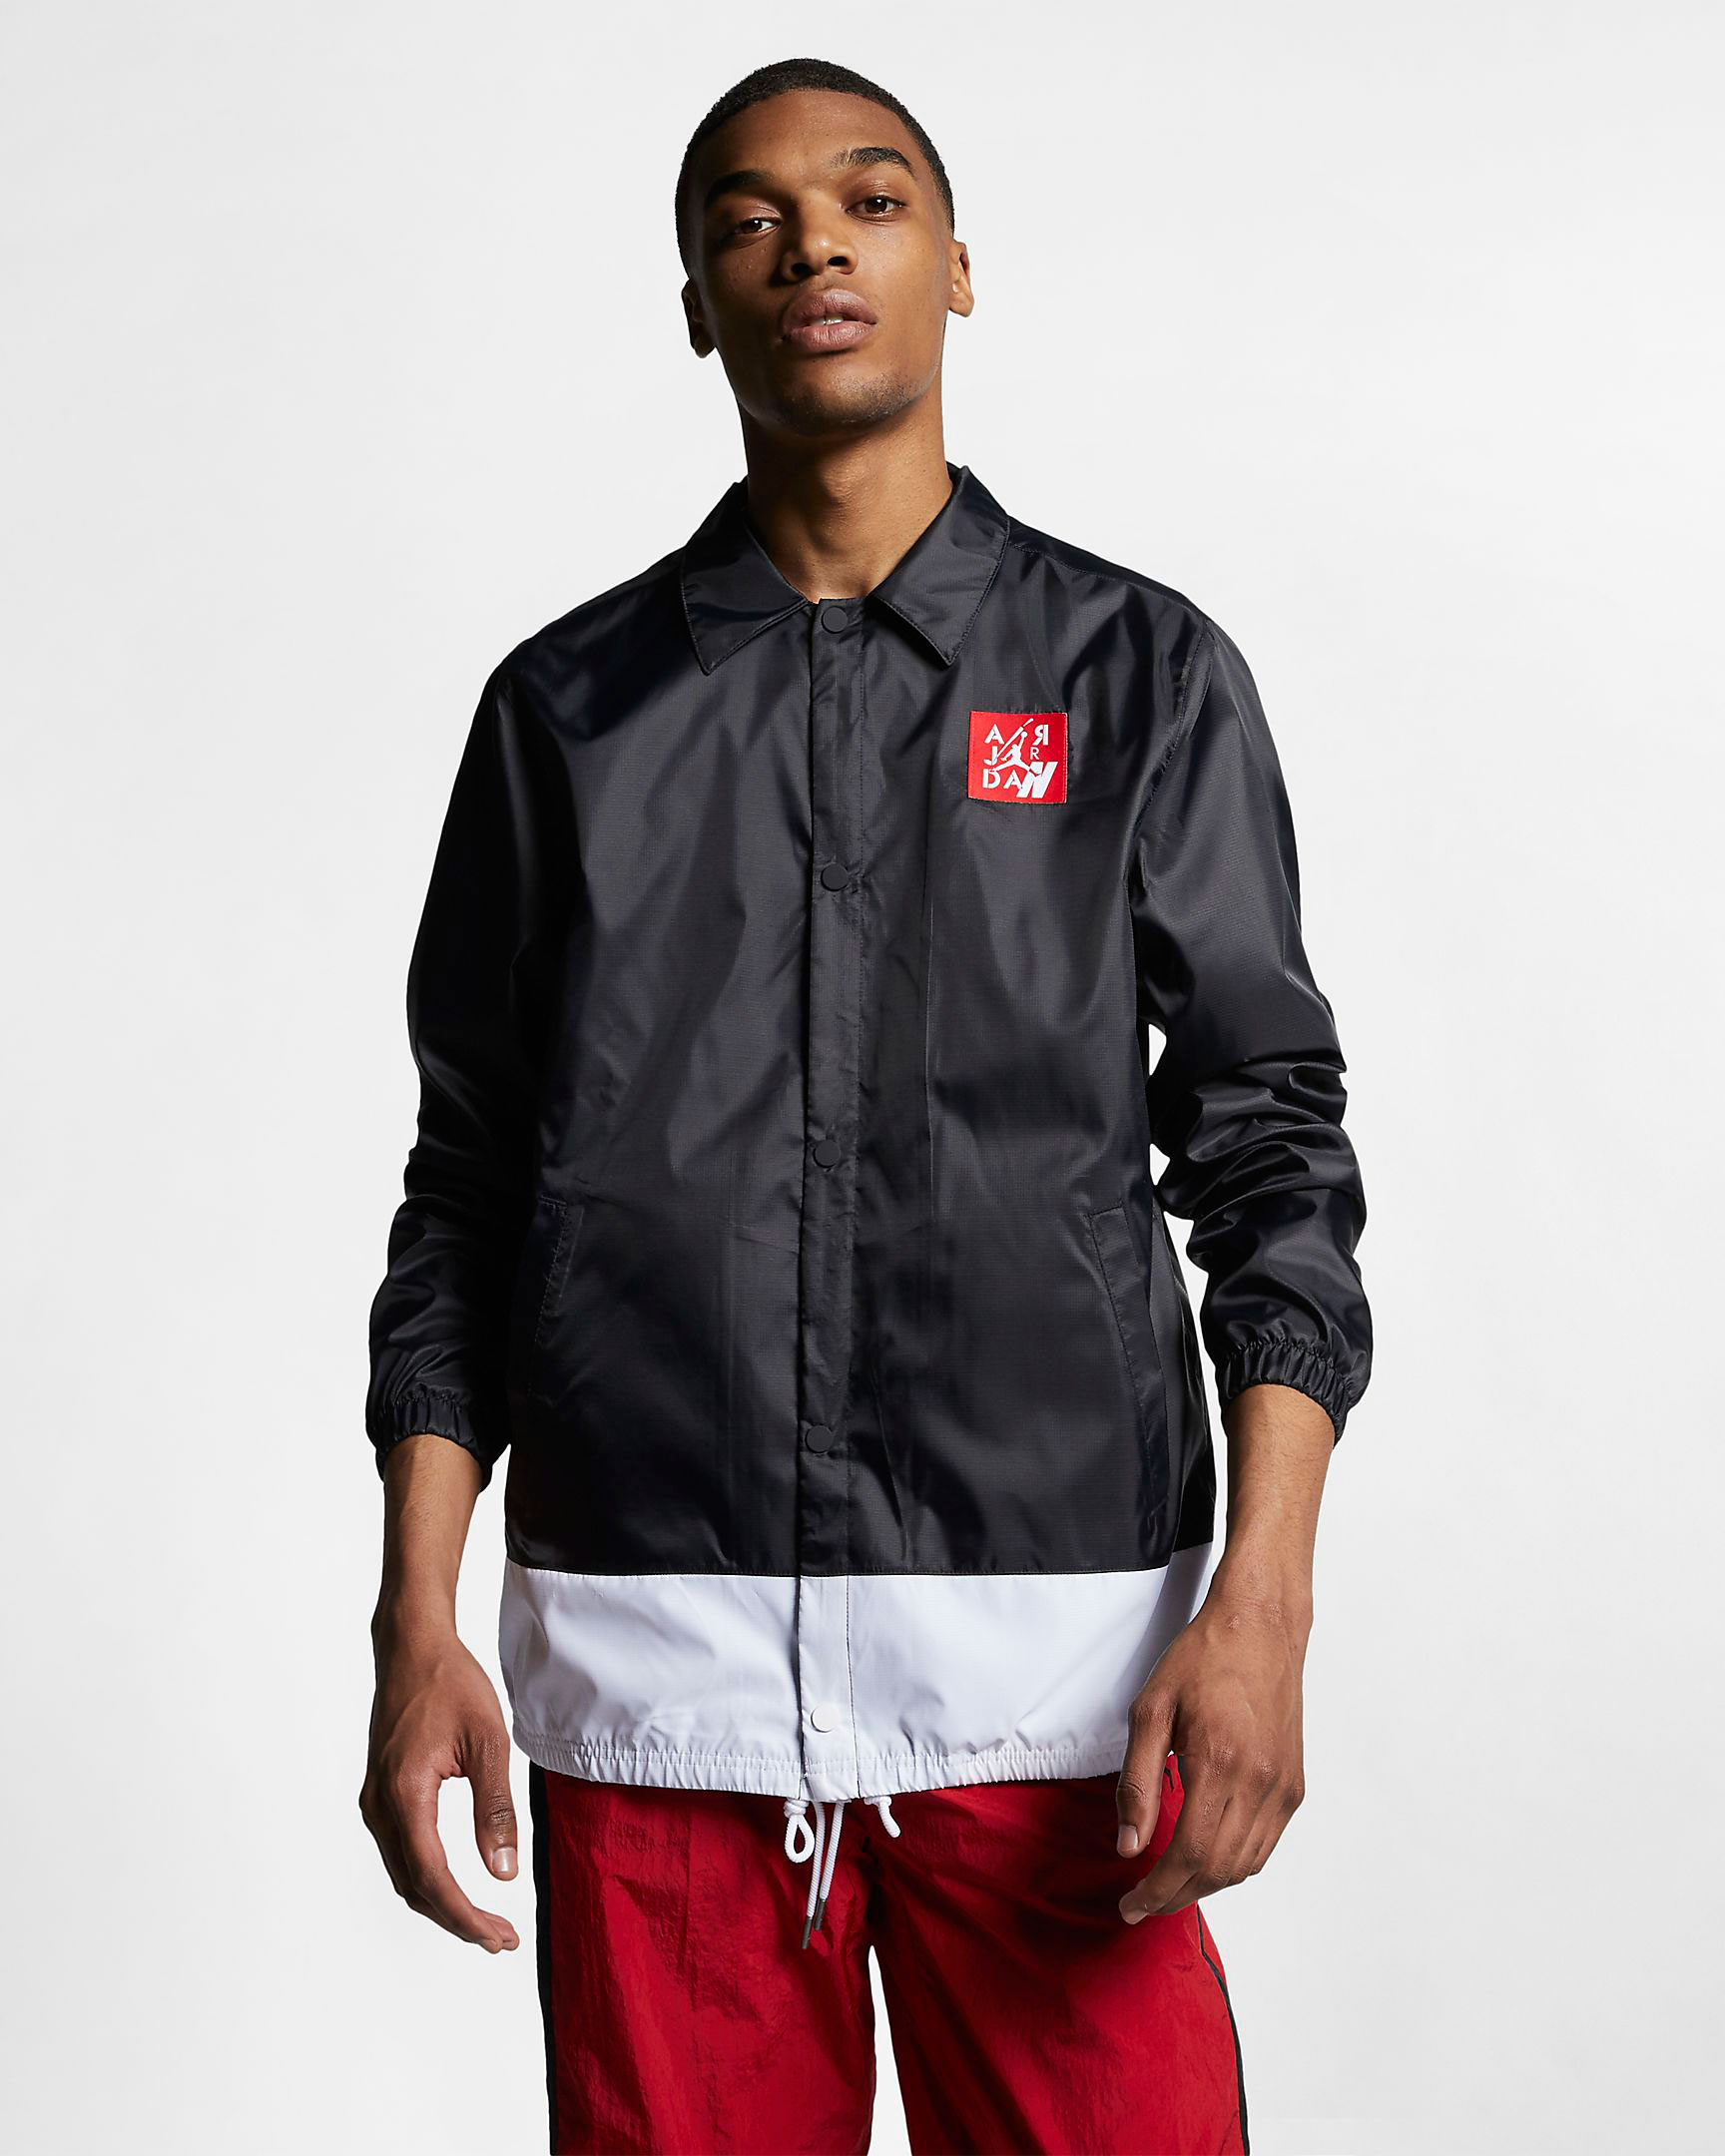 air-jordan-4-bred-2019-jacket-1